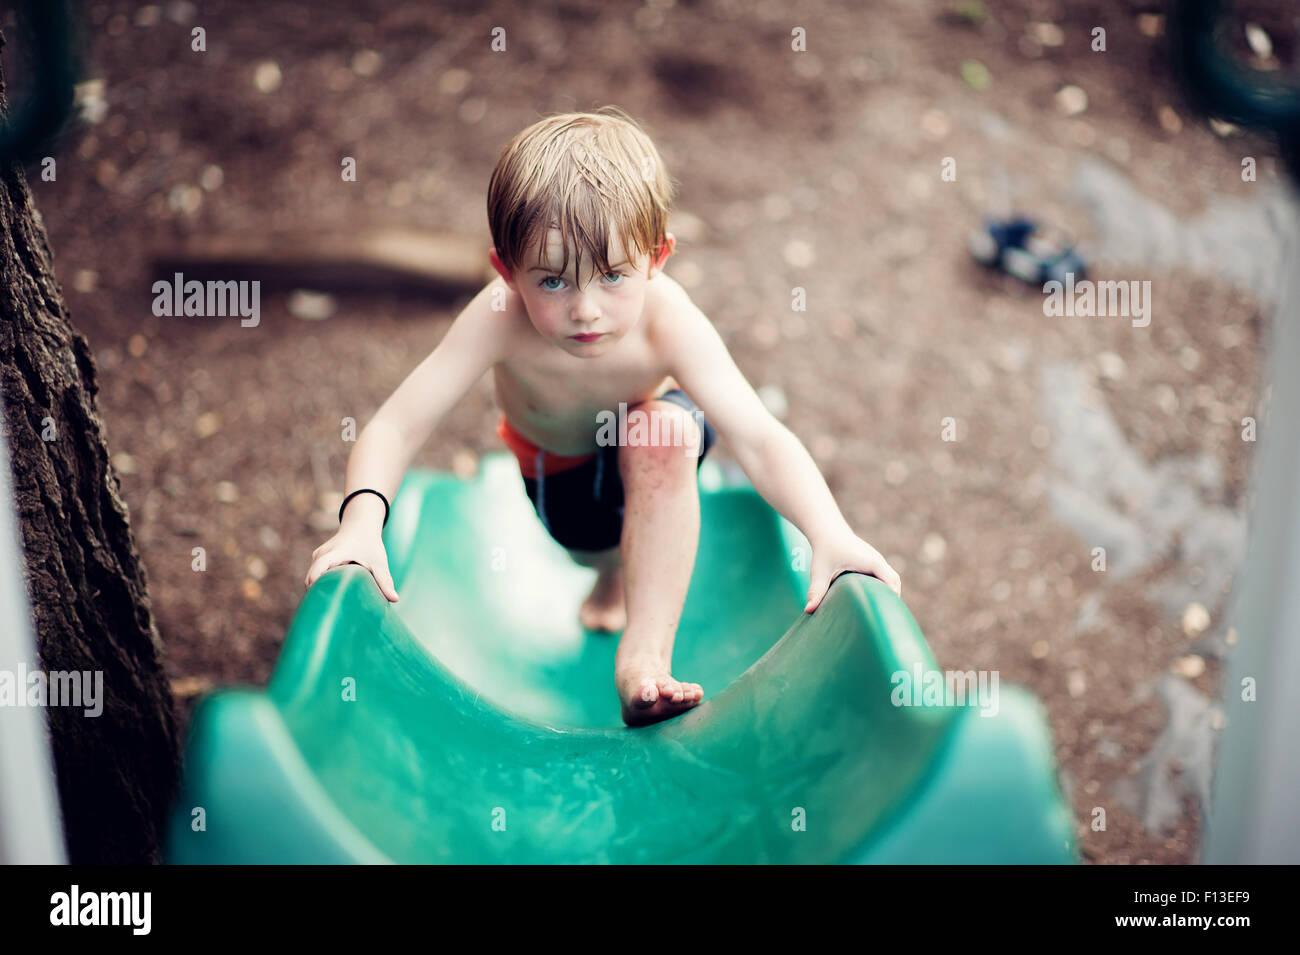 Boy climbing up a slide - Stock Image